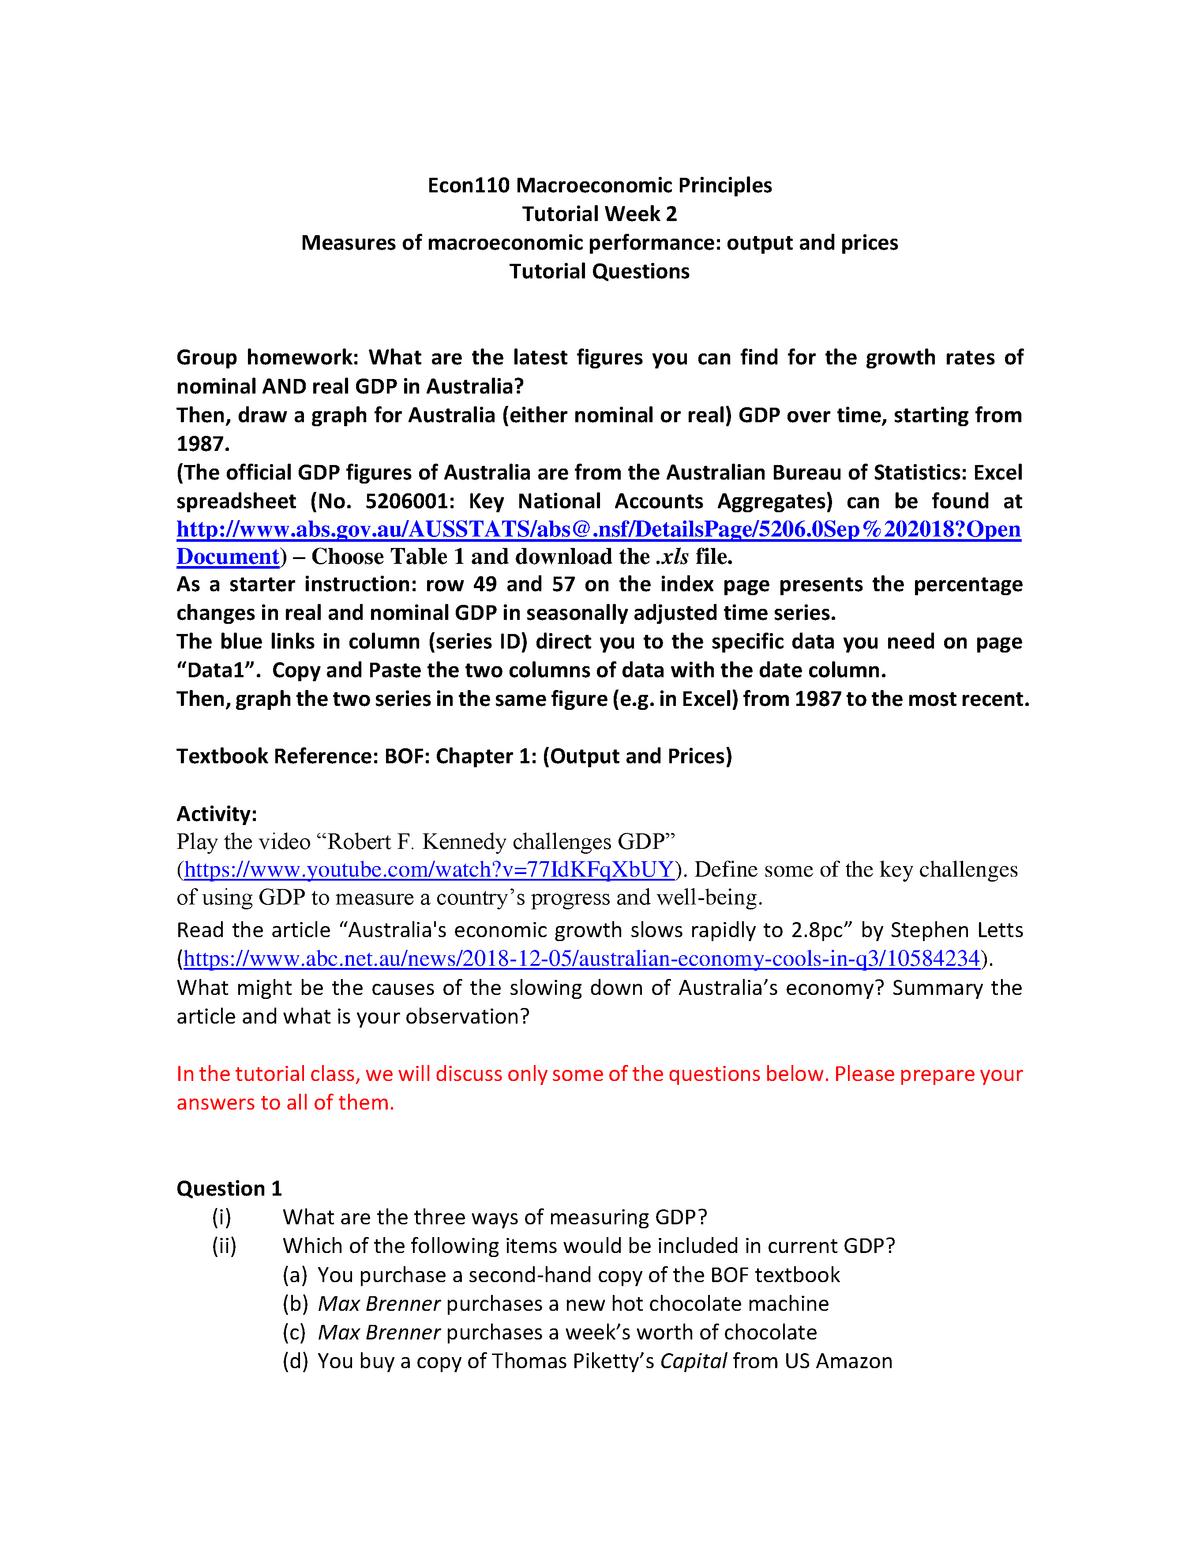 Week 2 Solutions ECON 110 - ECON111: Microeconomic